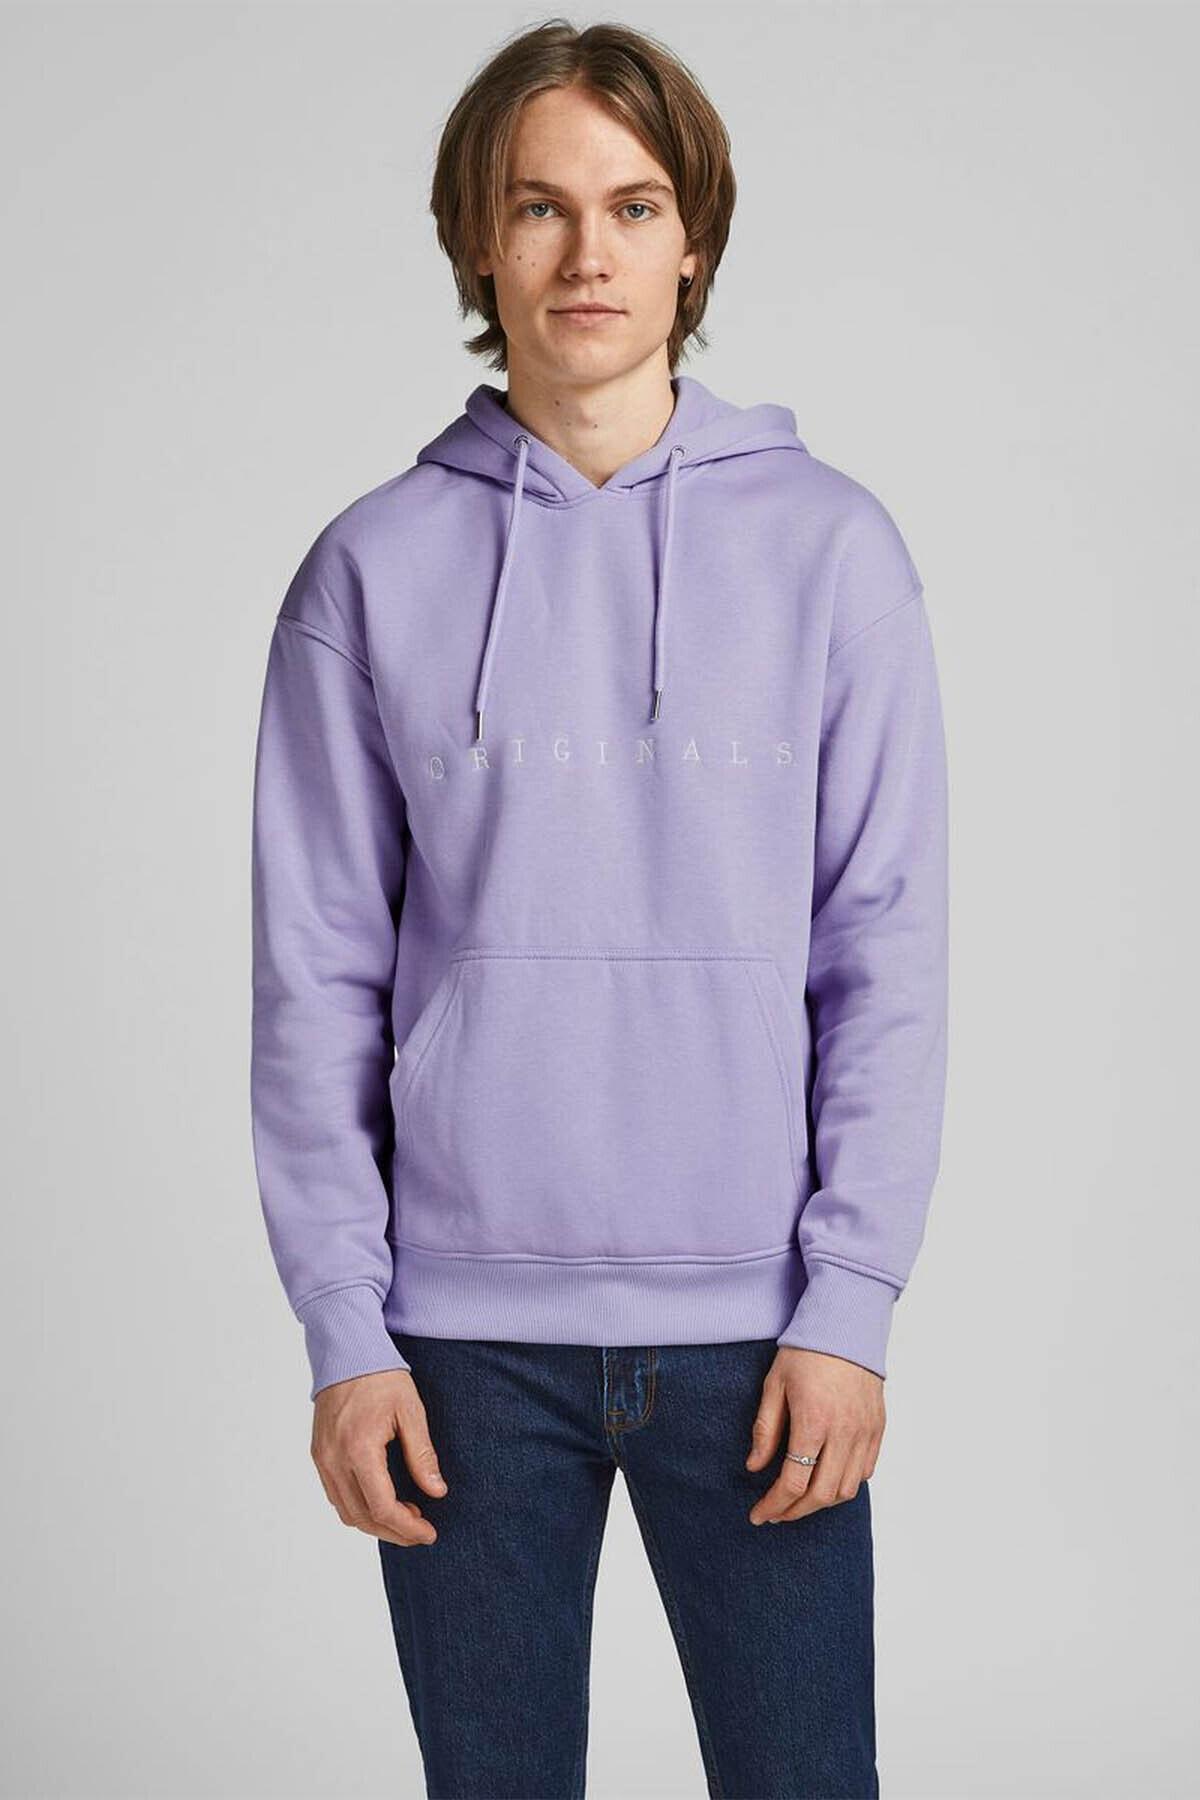 Jack & Jones Erkek Copenhagen Sweatshirt Loopback Relaxed Fıt Hoodıe - 12176864 2